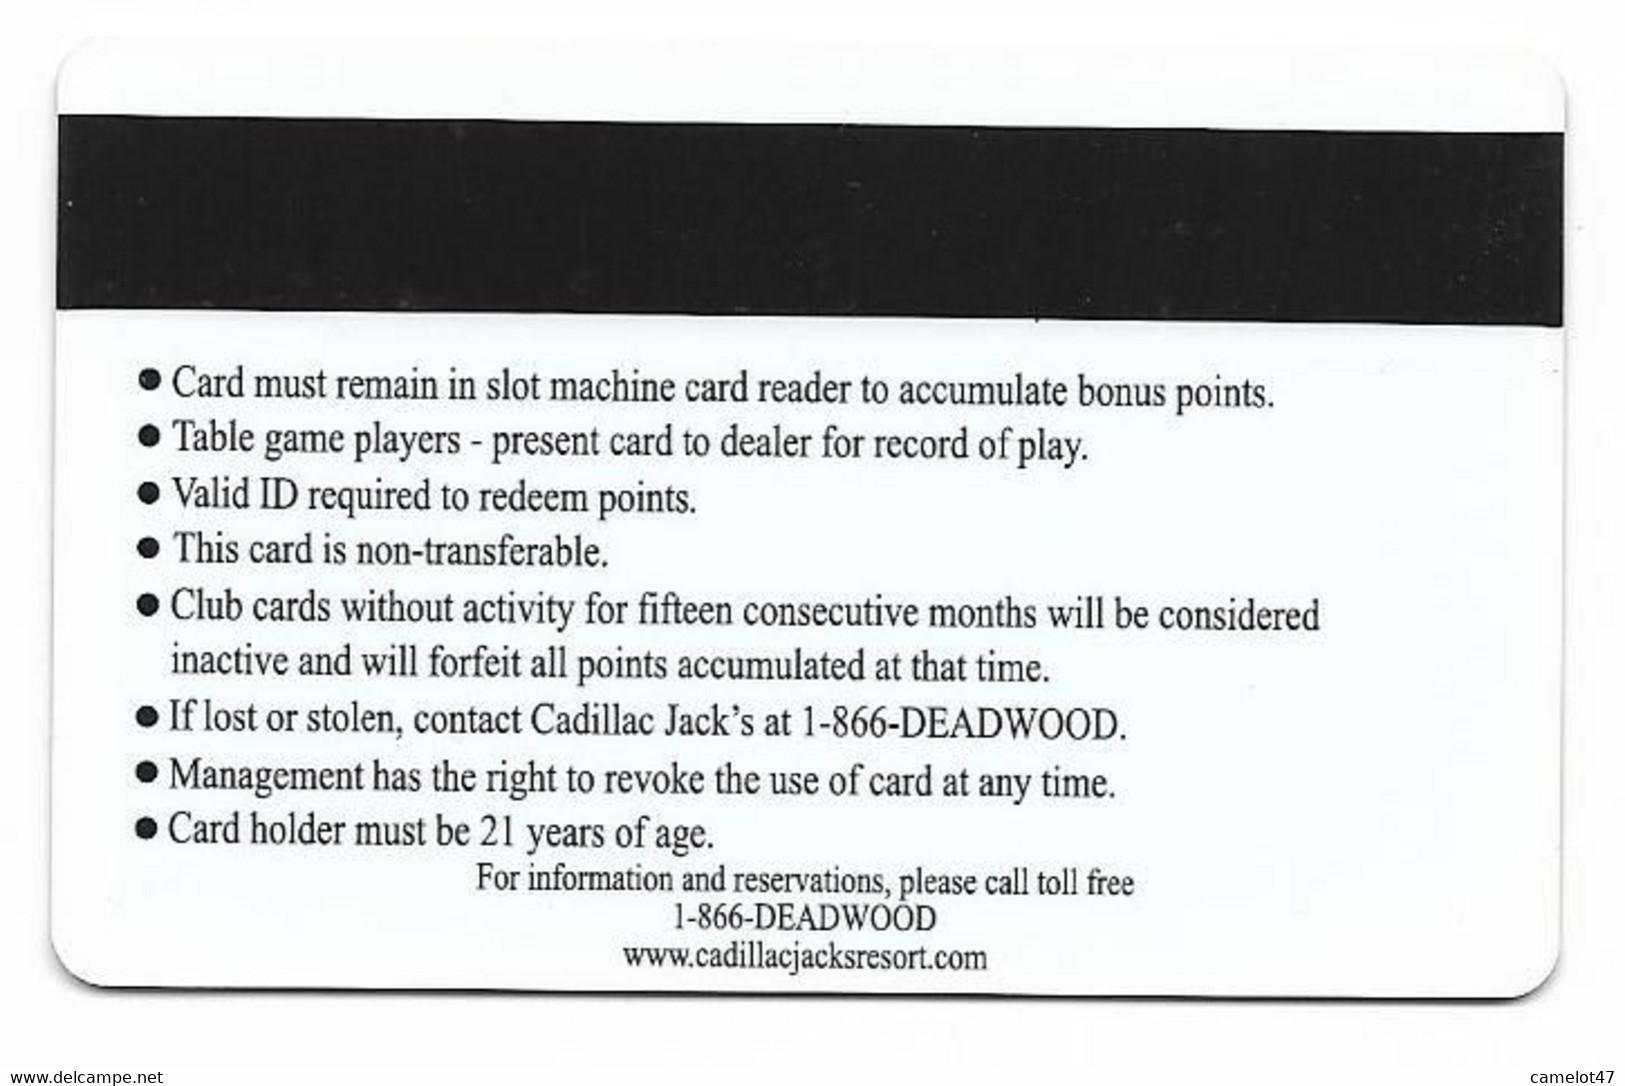 Cadillac Jack's Casino, Deadwood, SD, U.S.A. Older Used  BLANK Slot Or Player's Card, # Cadillacjacks-2blank - Casino Cards